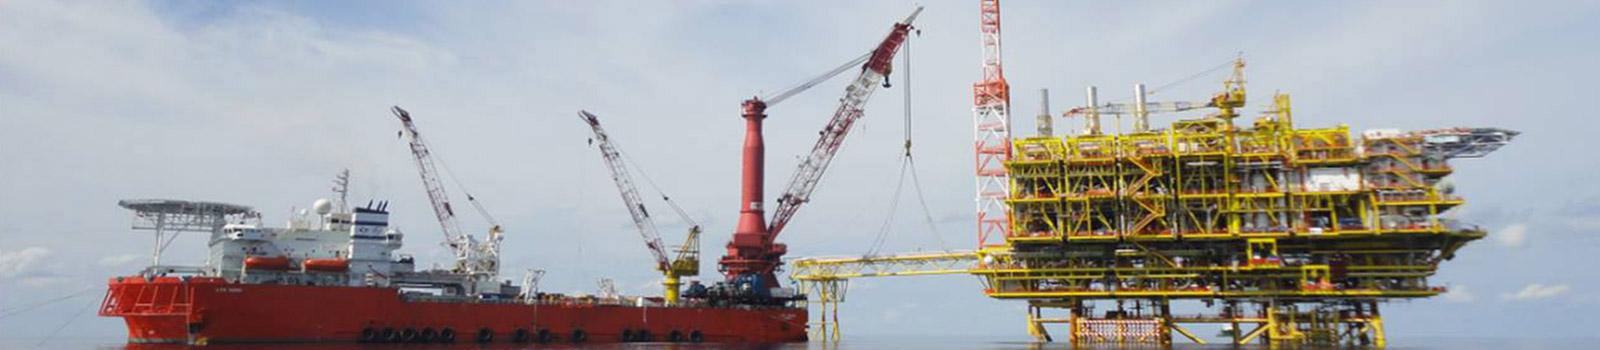 Pile Top Drilling Rig - L&T Sapura